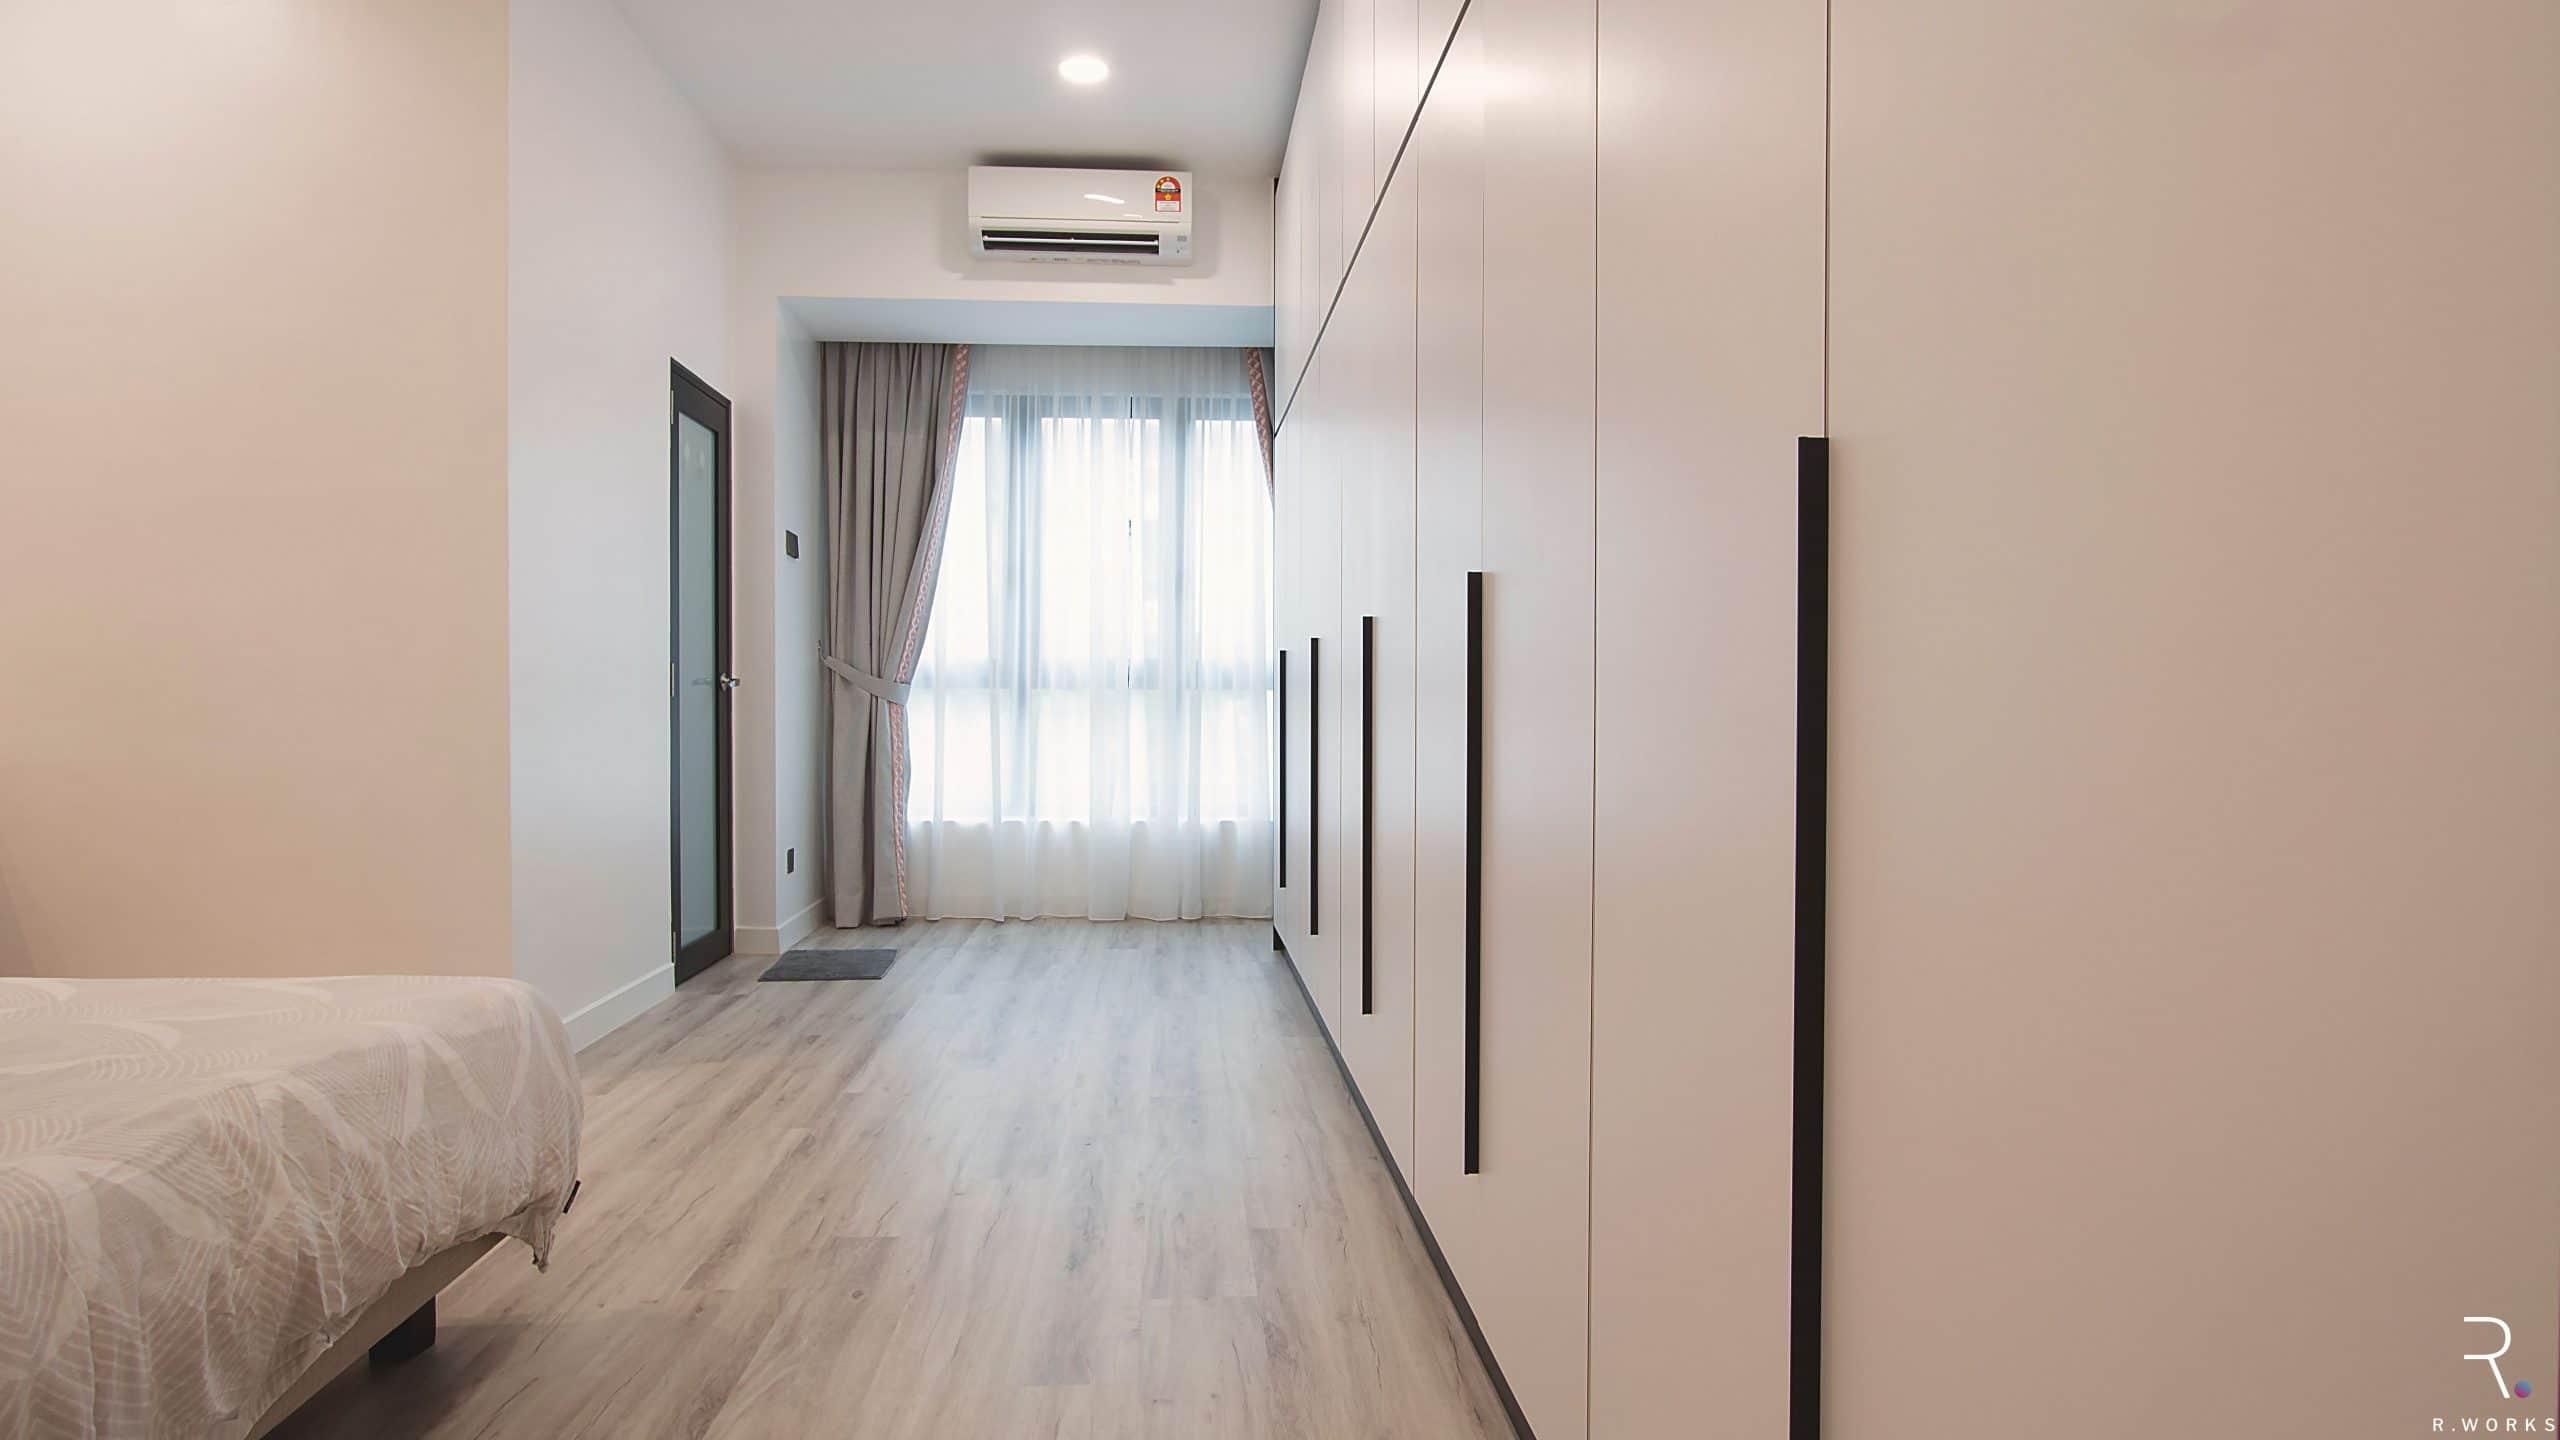 Townhouse modern bedroom after interior design